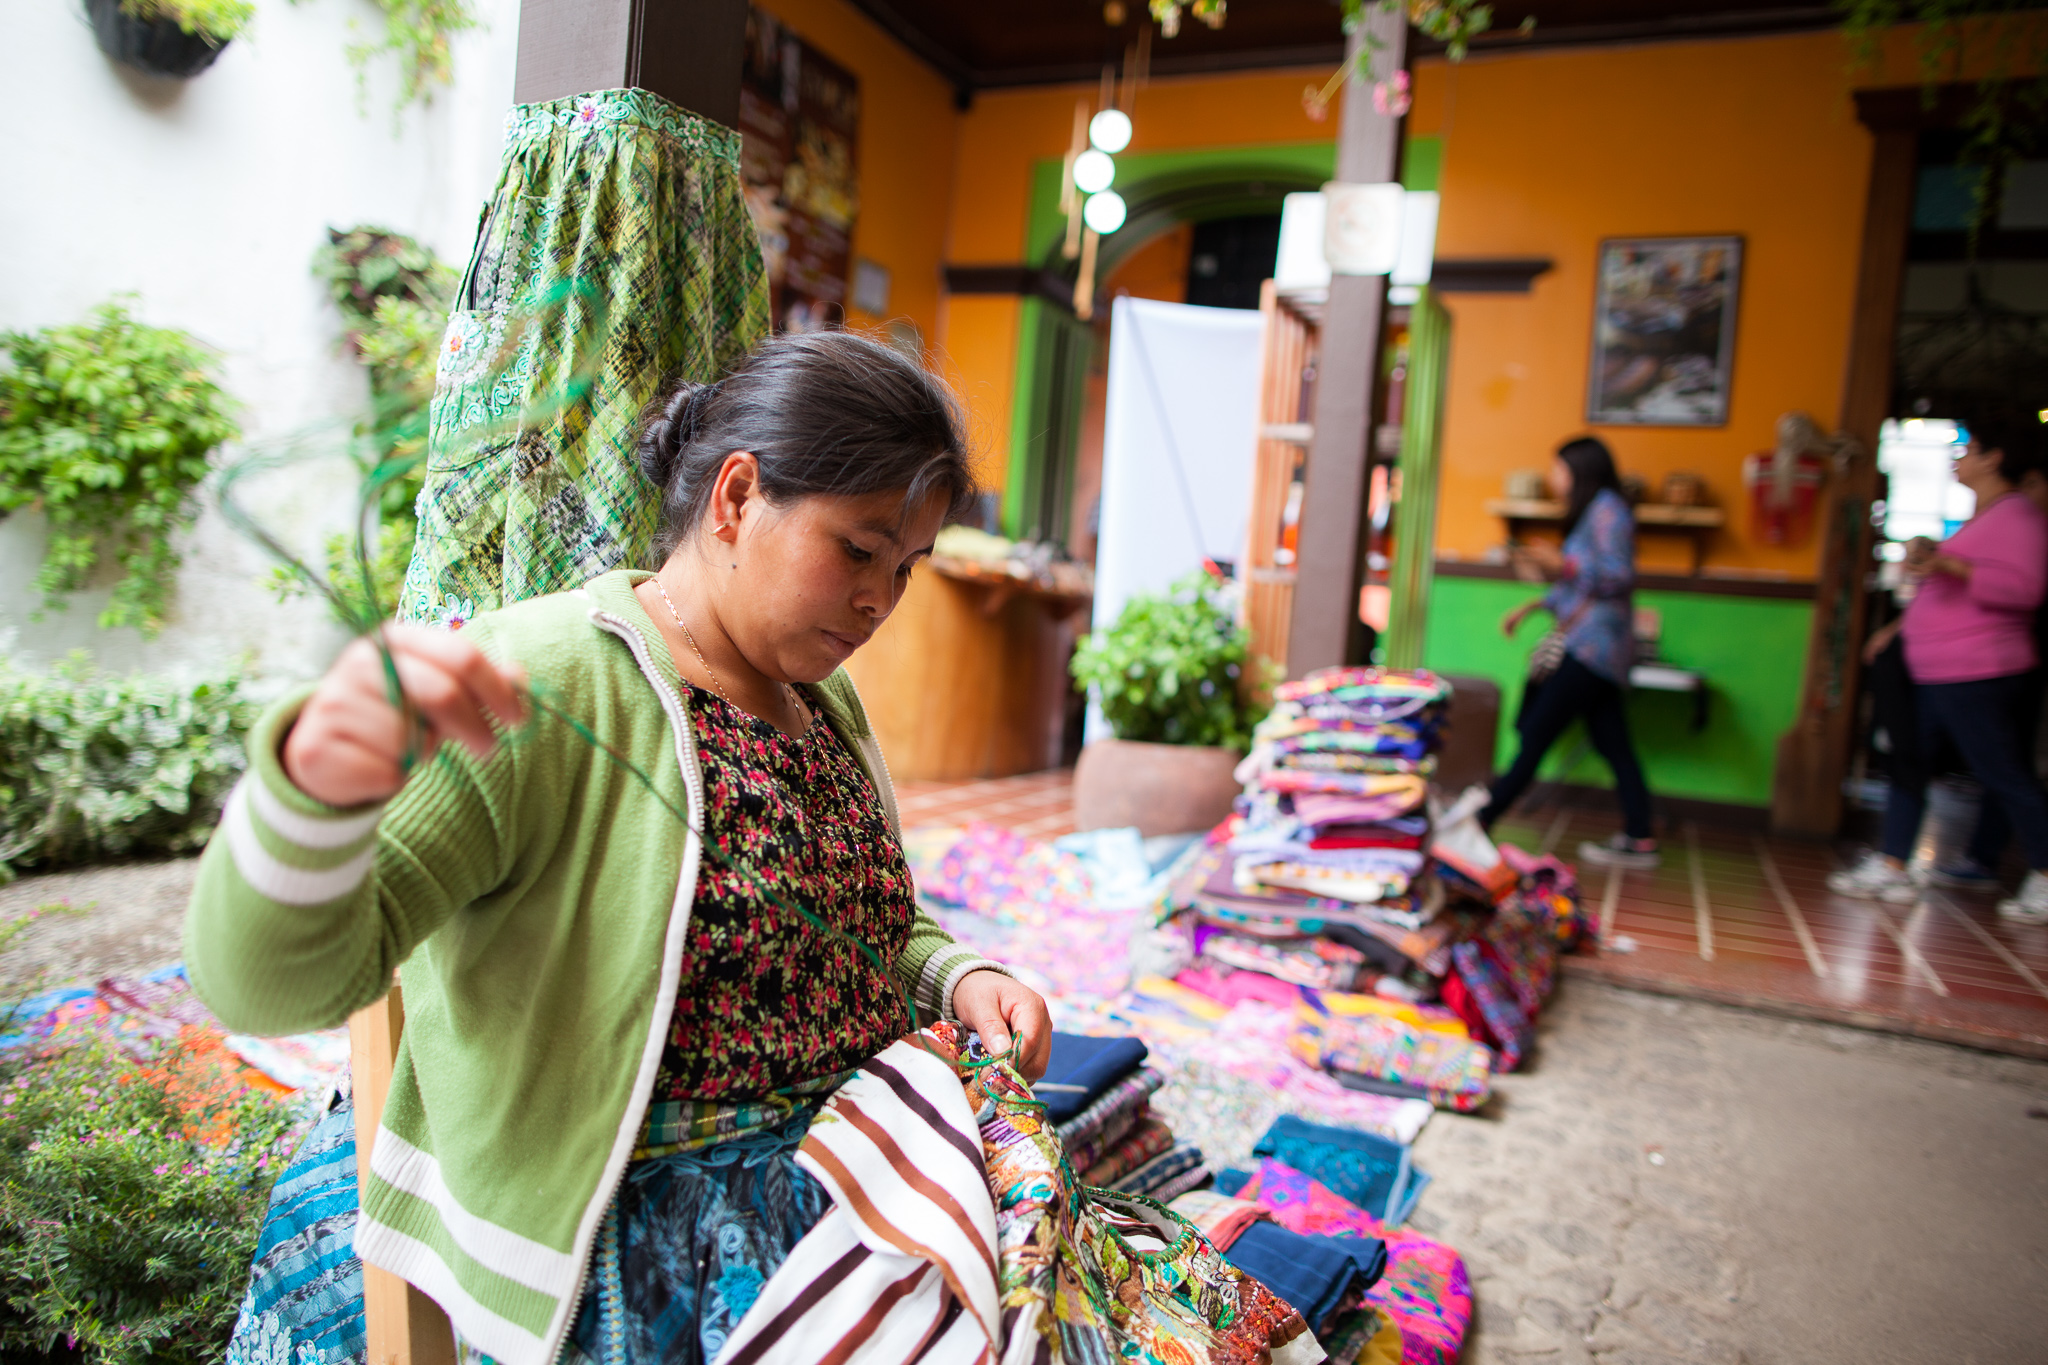 Guatemala-CP-160804-006.jpg